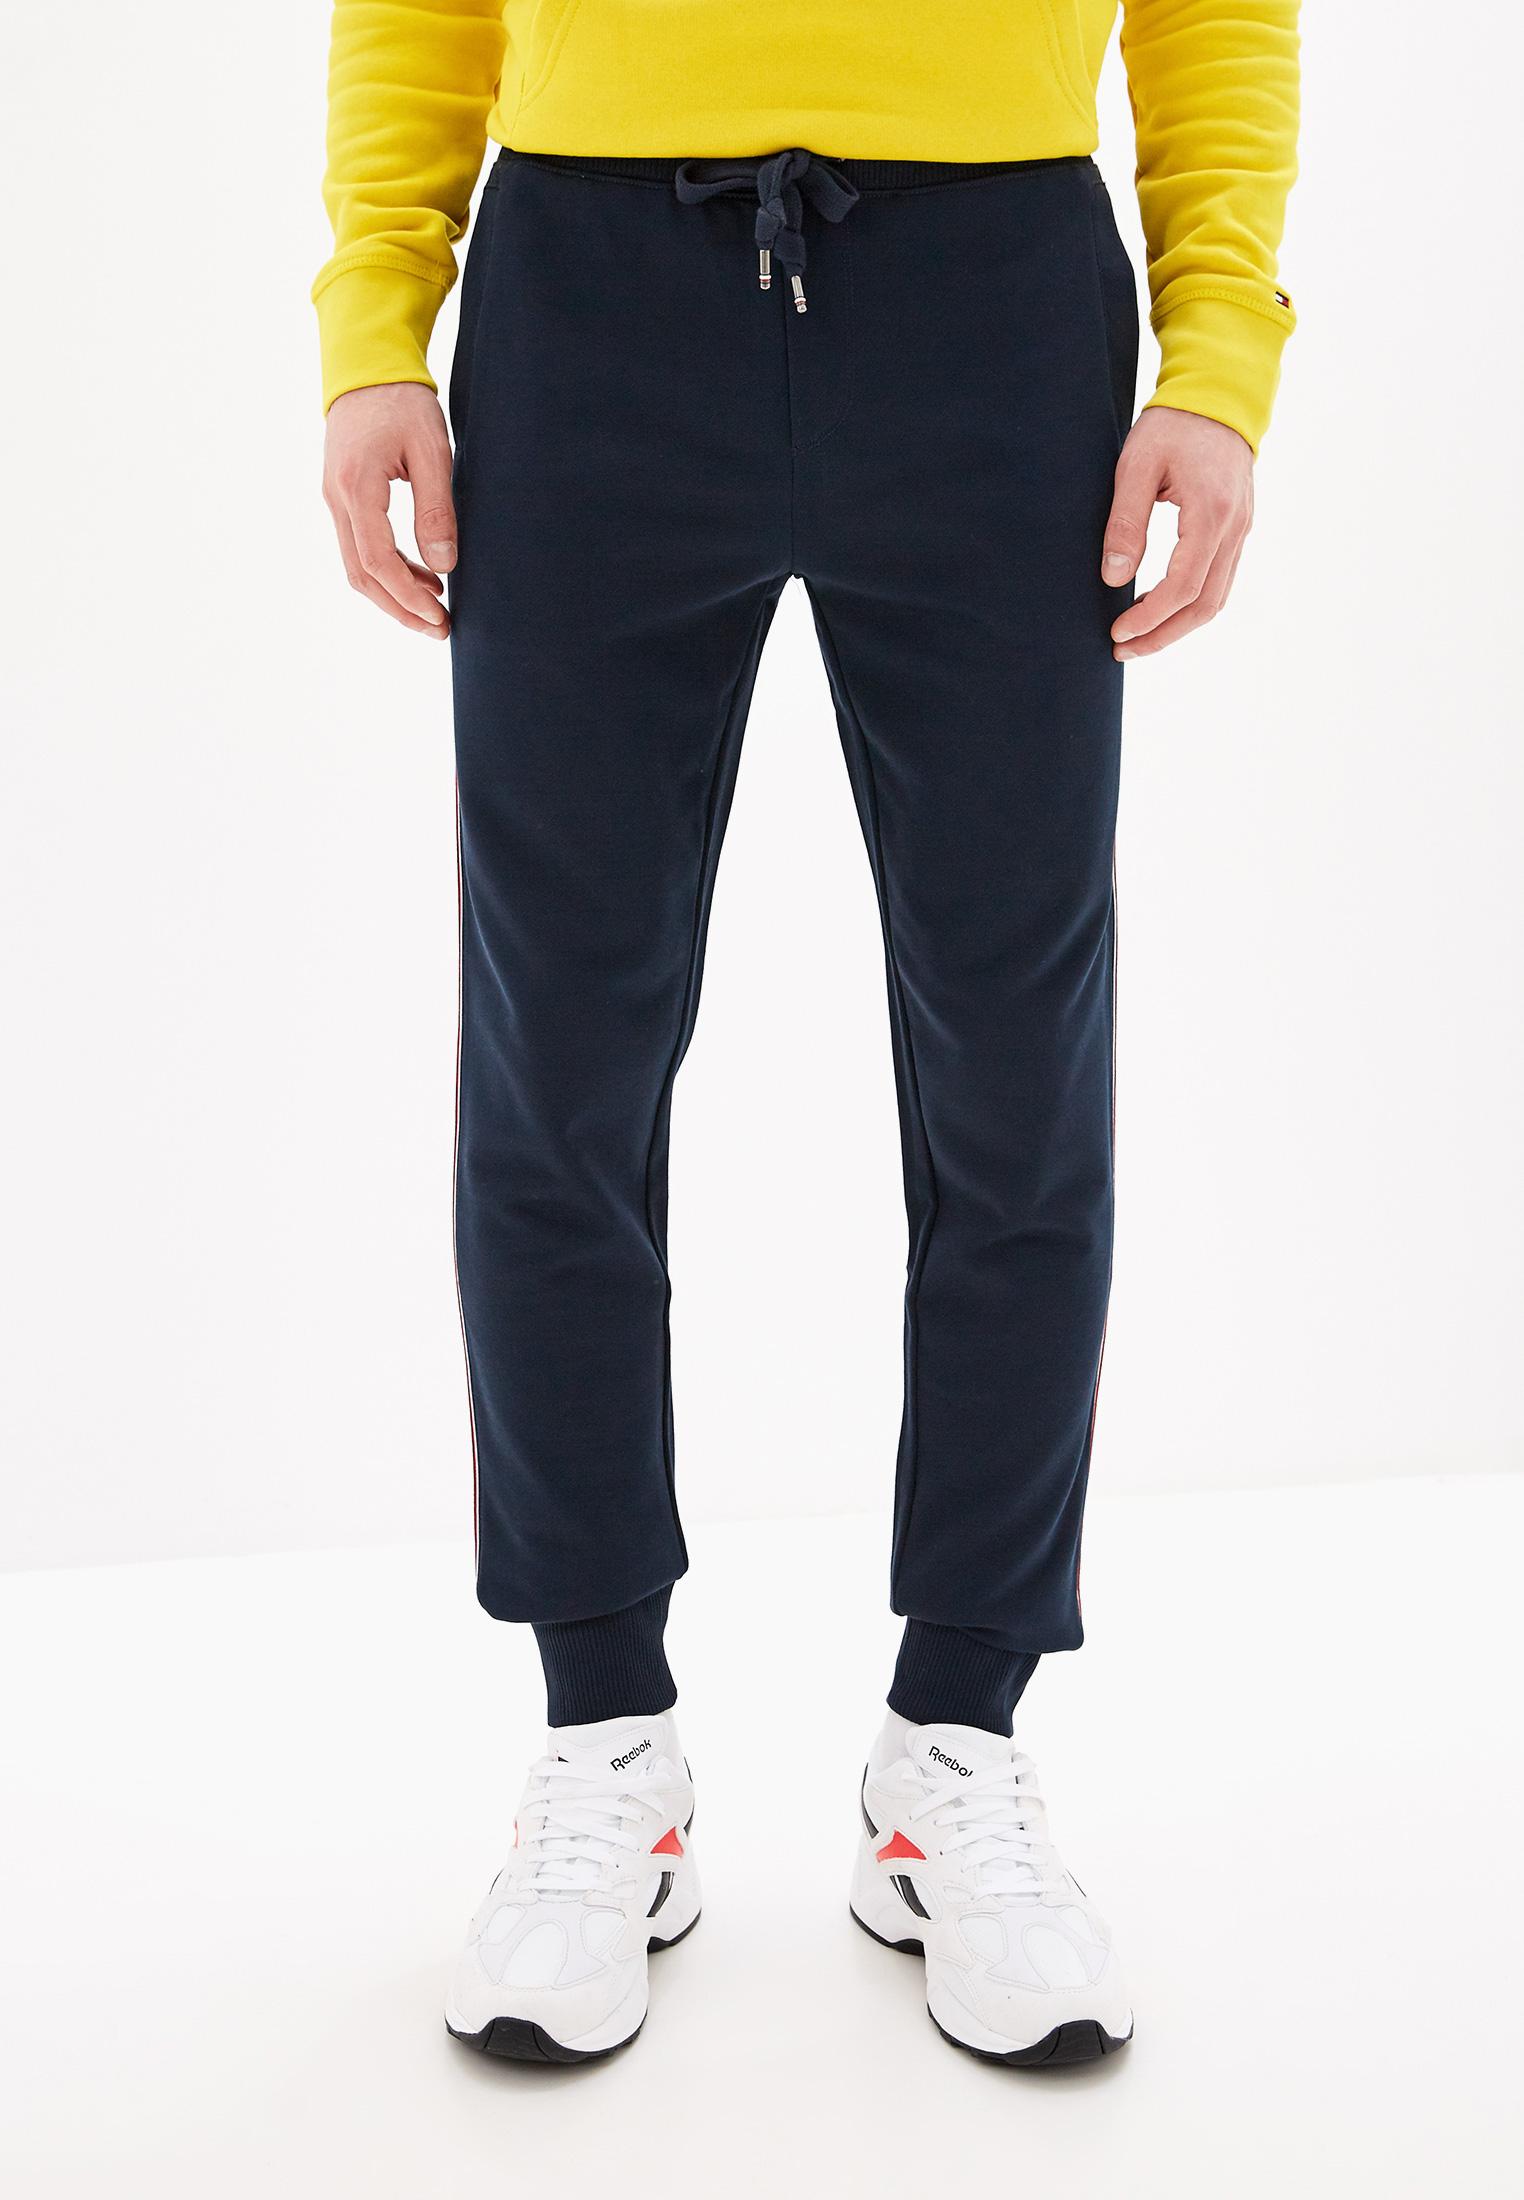 Мужские спортивные брюки Tommy Hilfiger (Томми Хилфигер) MW0MW10513